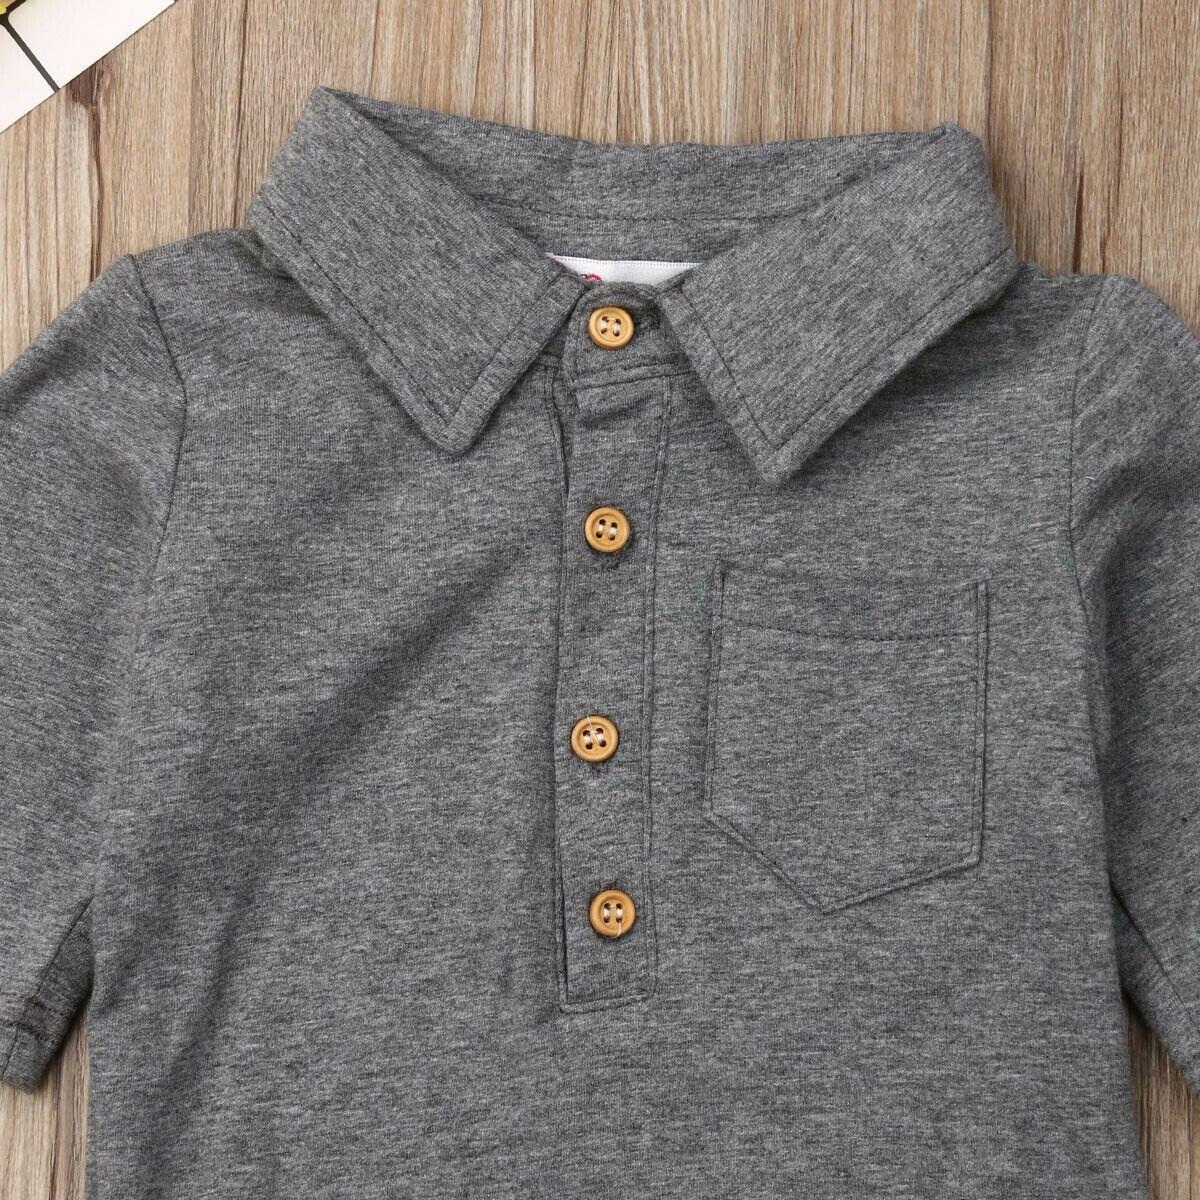 Baby Sommer Kleidung Infant Baby Boy Gentleman Feste Formale Bodysuit Kurzarm Down Kragen Hemden Jumpsuit Set